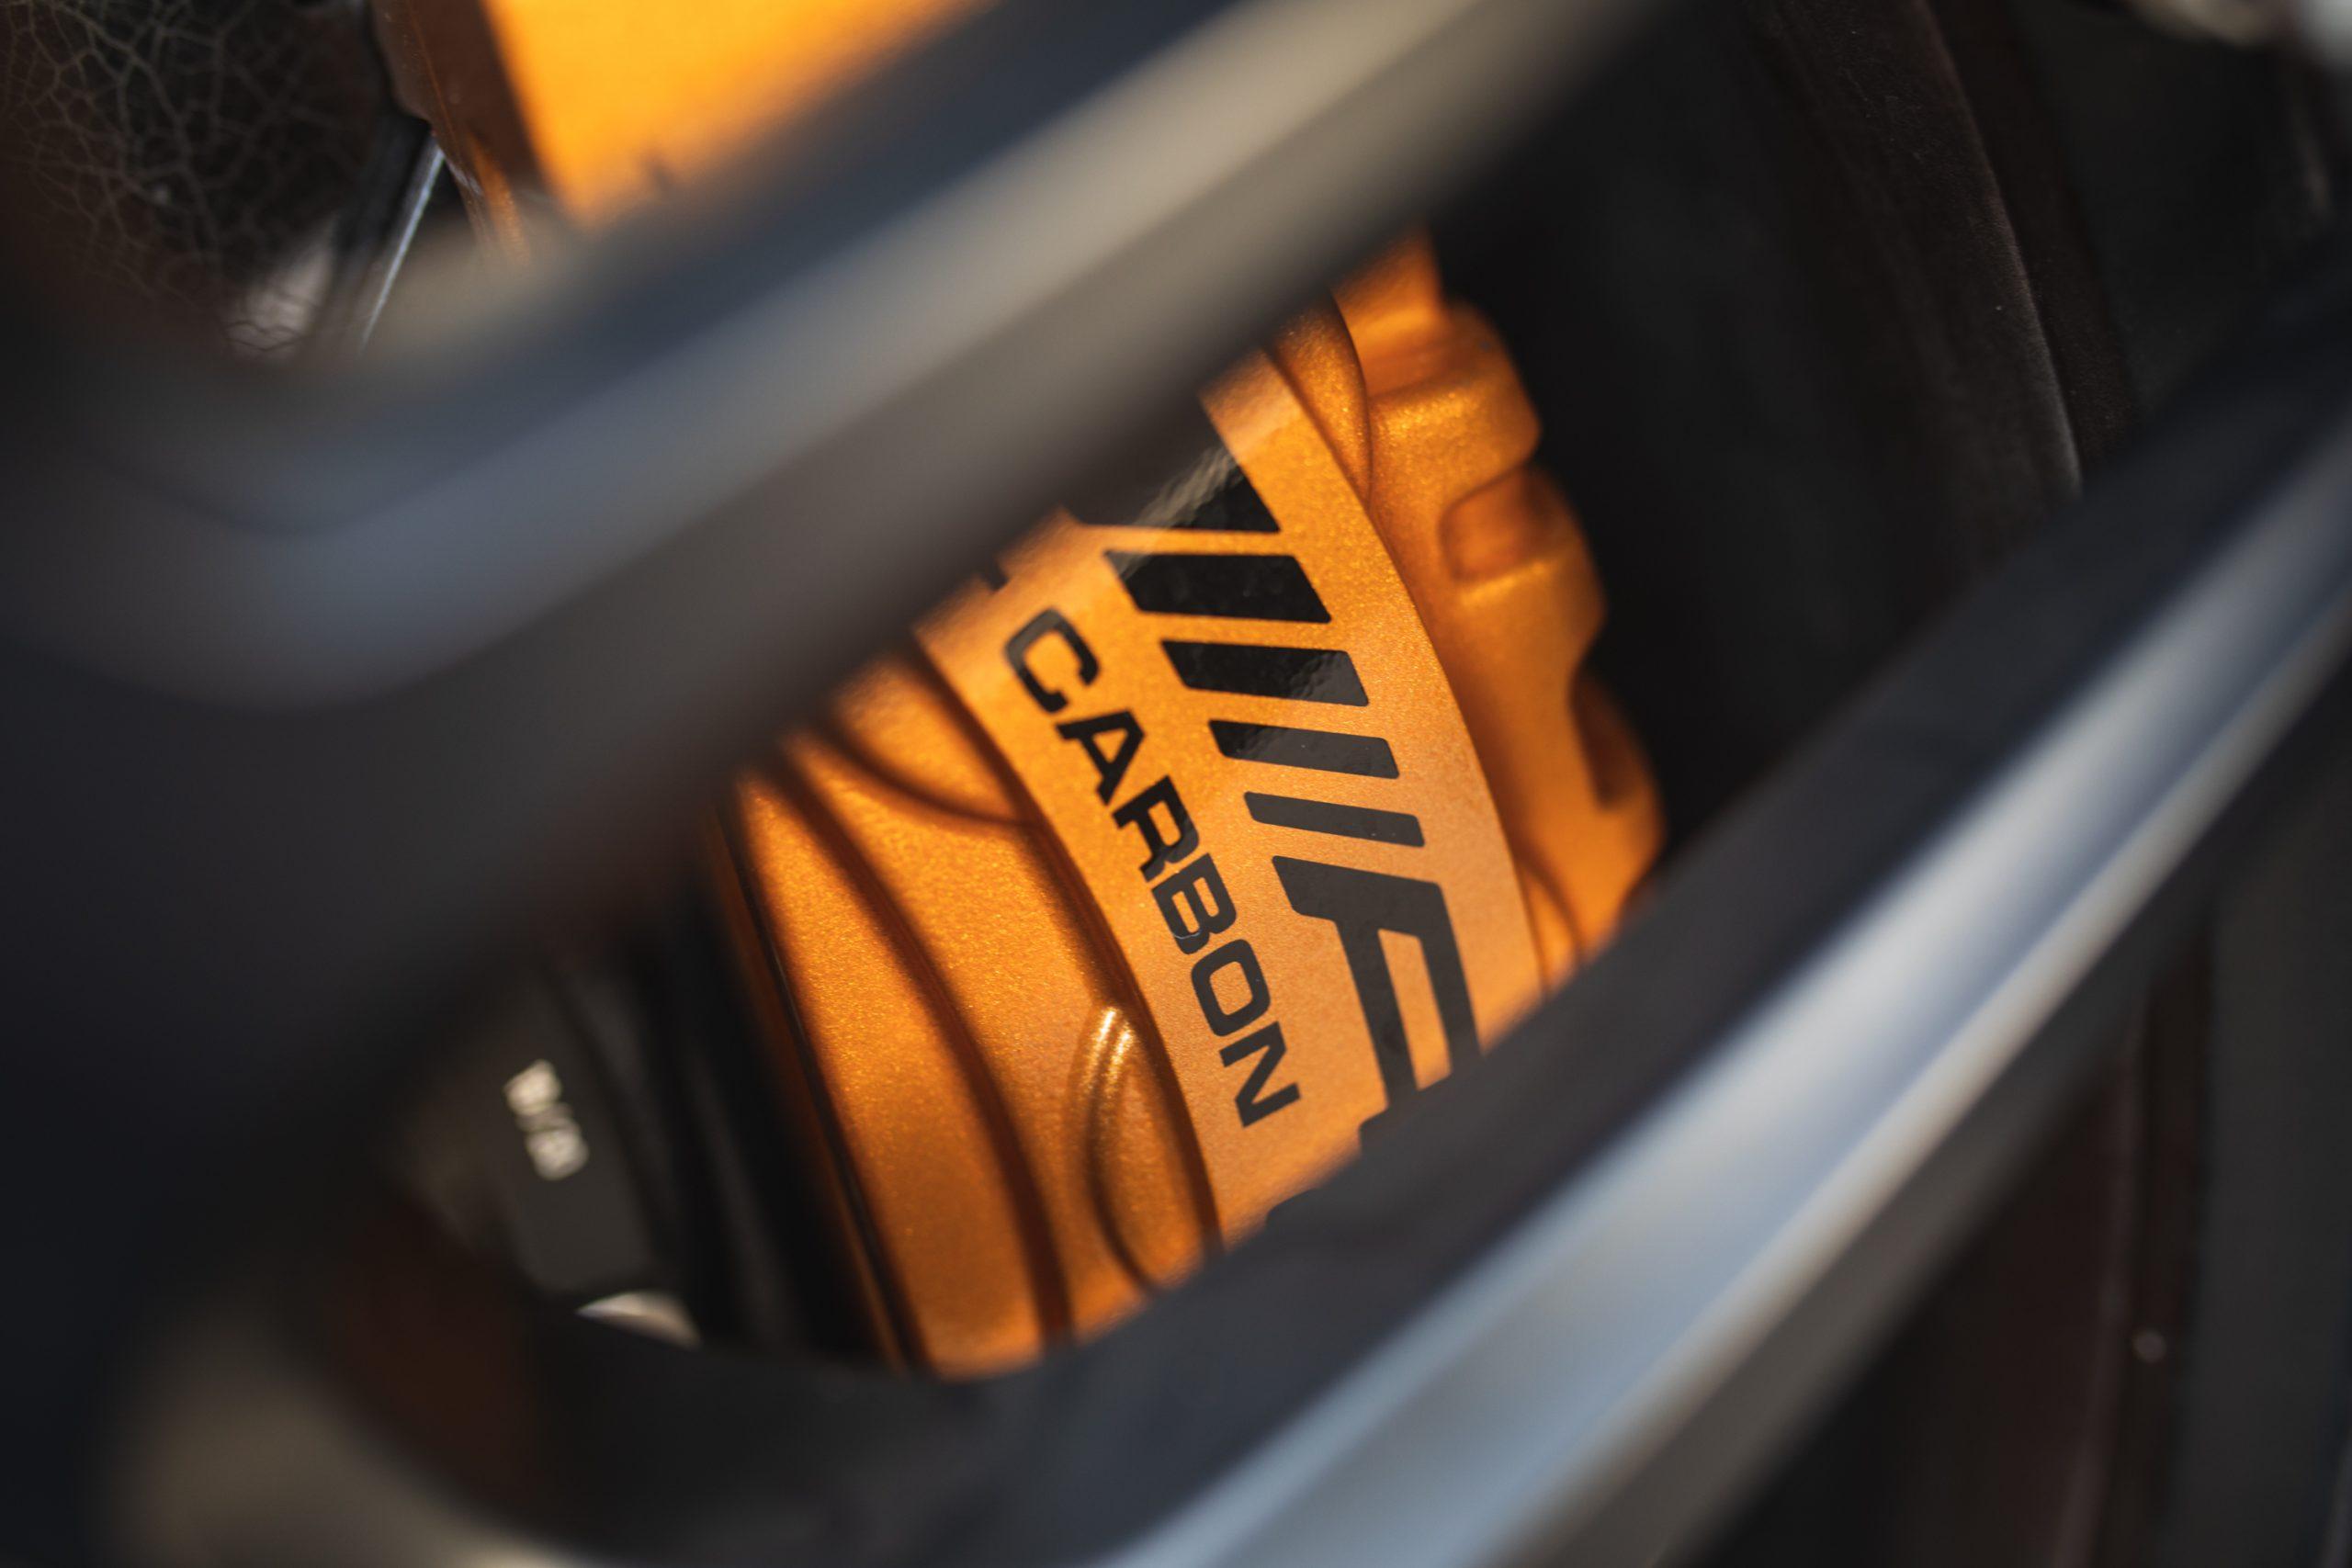 2021 Mercedes-AMG E63 S carbon ceramic brakes calipers detail